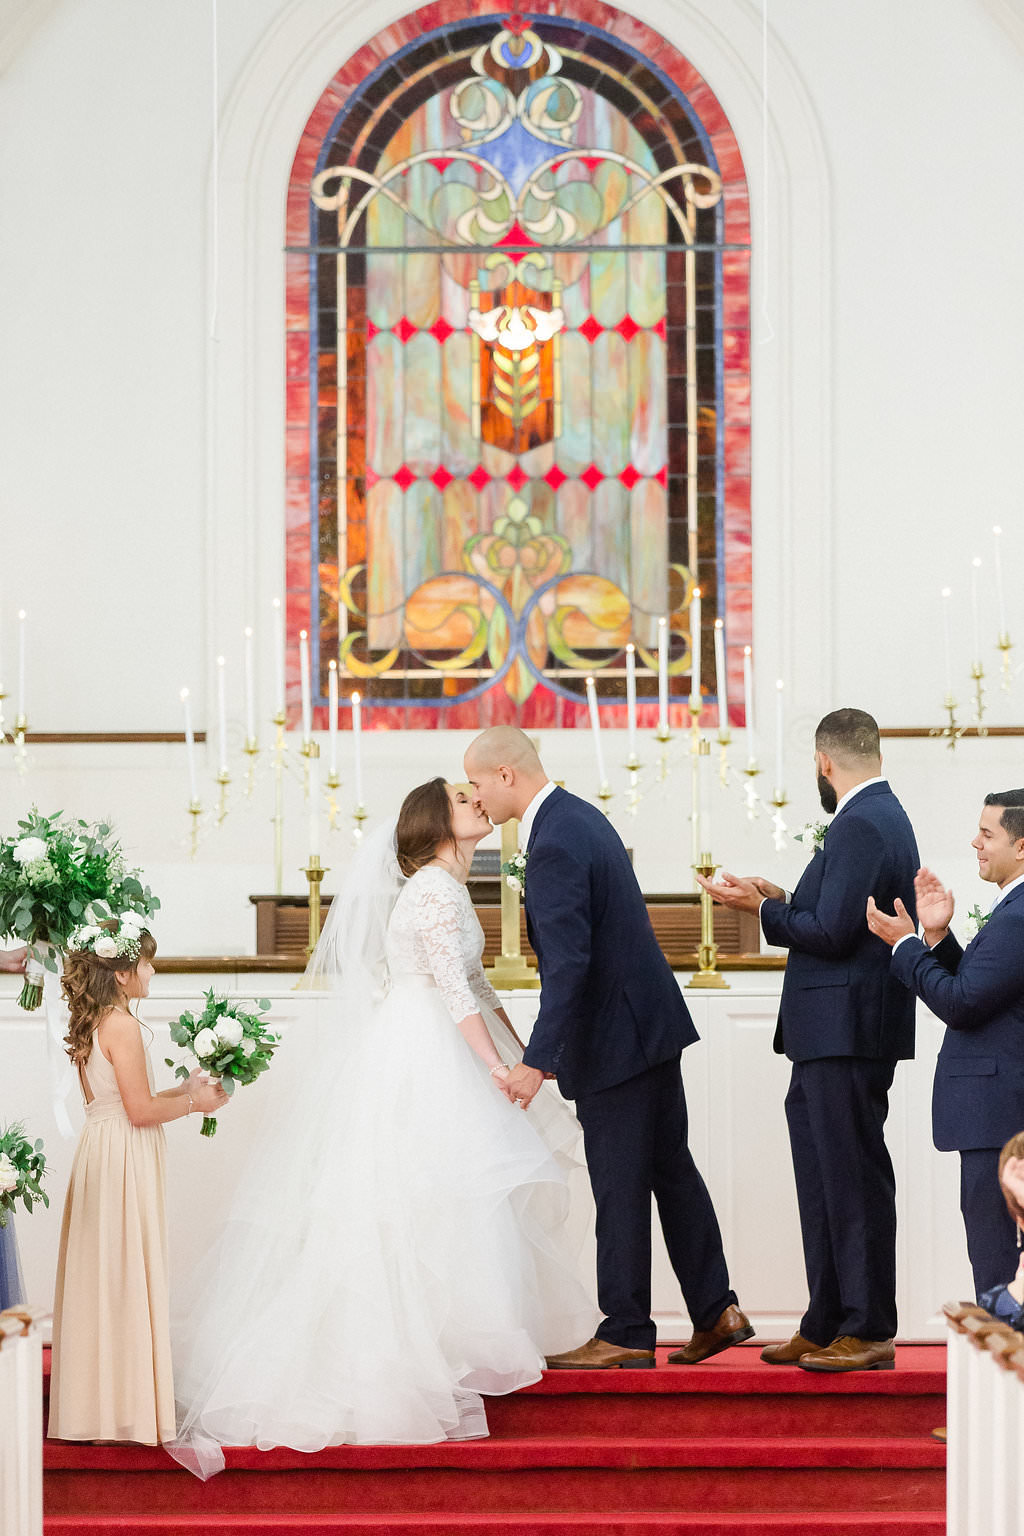 Florida Bride and Groom Traditional Church Wedding Ceremony Exchanging Vows | South Tampa Wedding Ceremony Venue Hyde Park Presbyterian Church